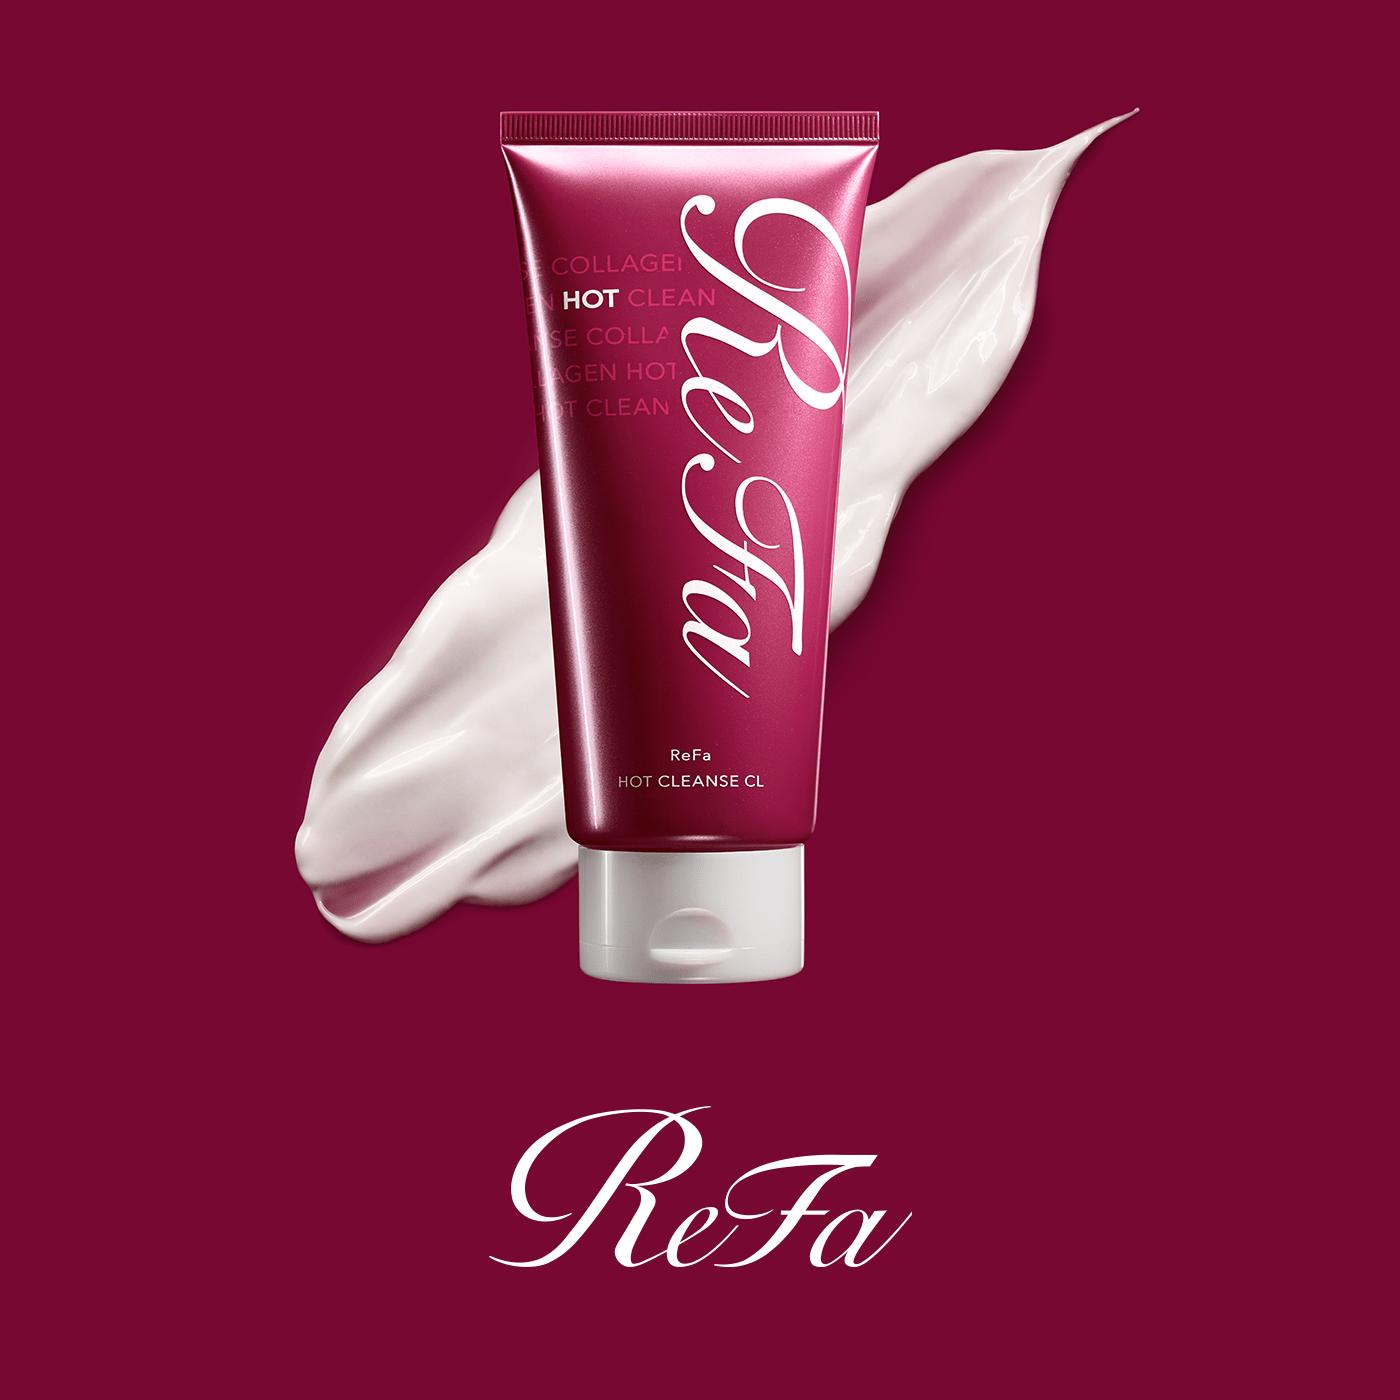 ReFaのコラーゲン美容を進化させる2種のコラーゲン配合濃密温感クレンジングクリーム「ReFa HOT CLEANSE CL」誕生